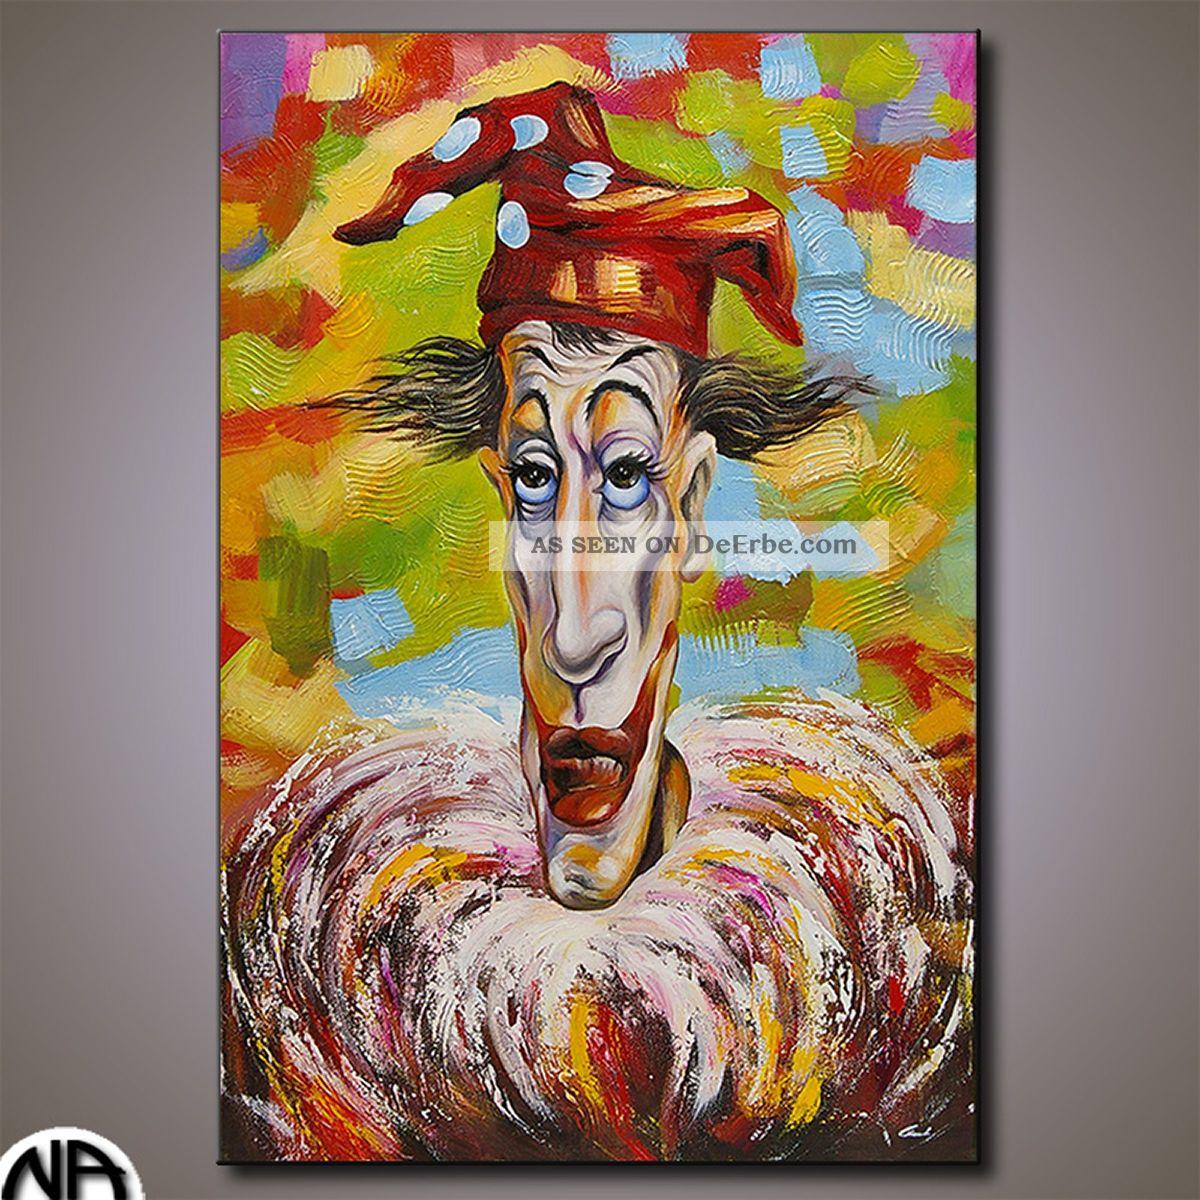 Gemlde Acryl Leinwand Malerei Bilder Abstrakt Kunst Art